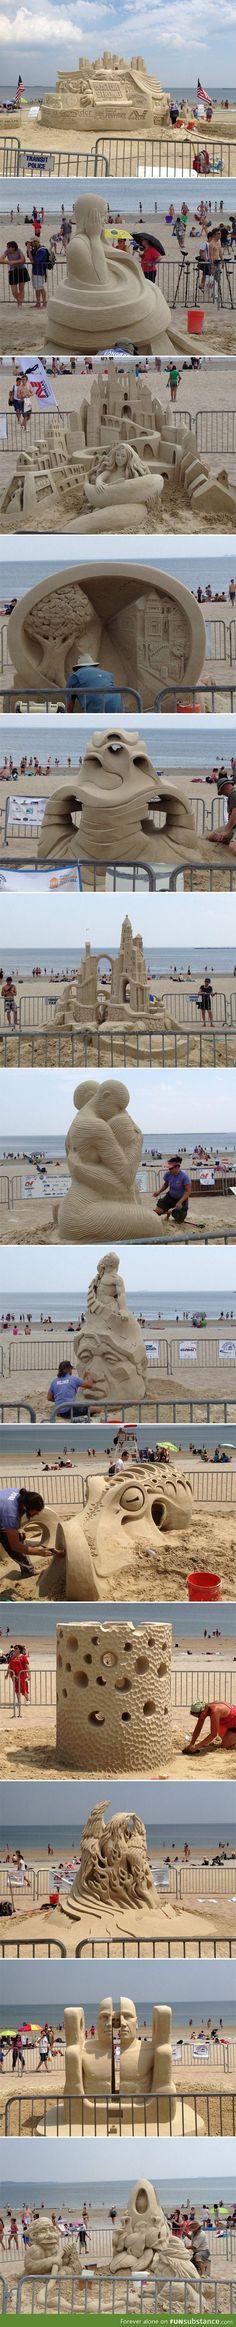 Revere beach sand sculpting festival, the octopus was the winner